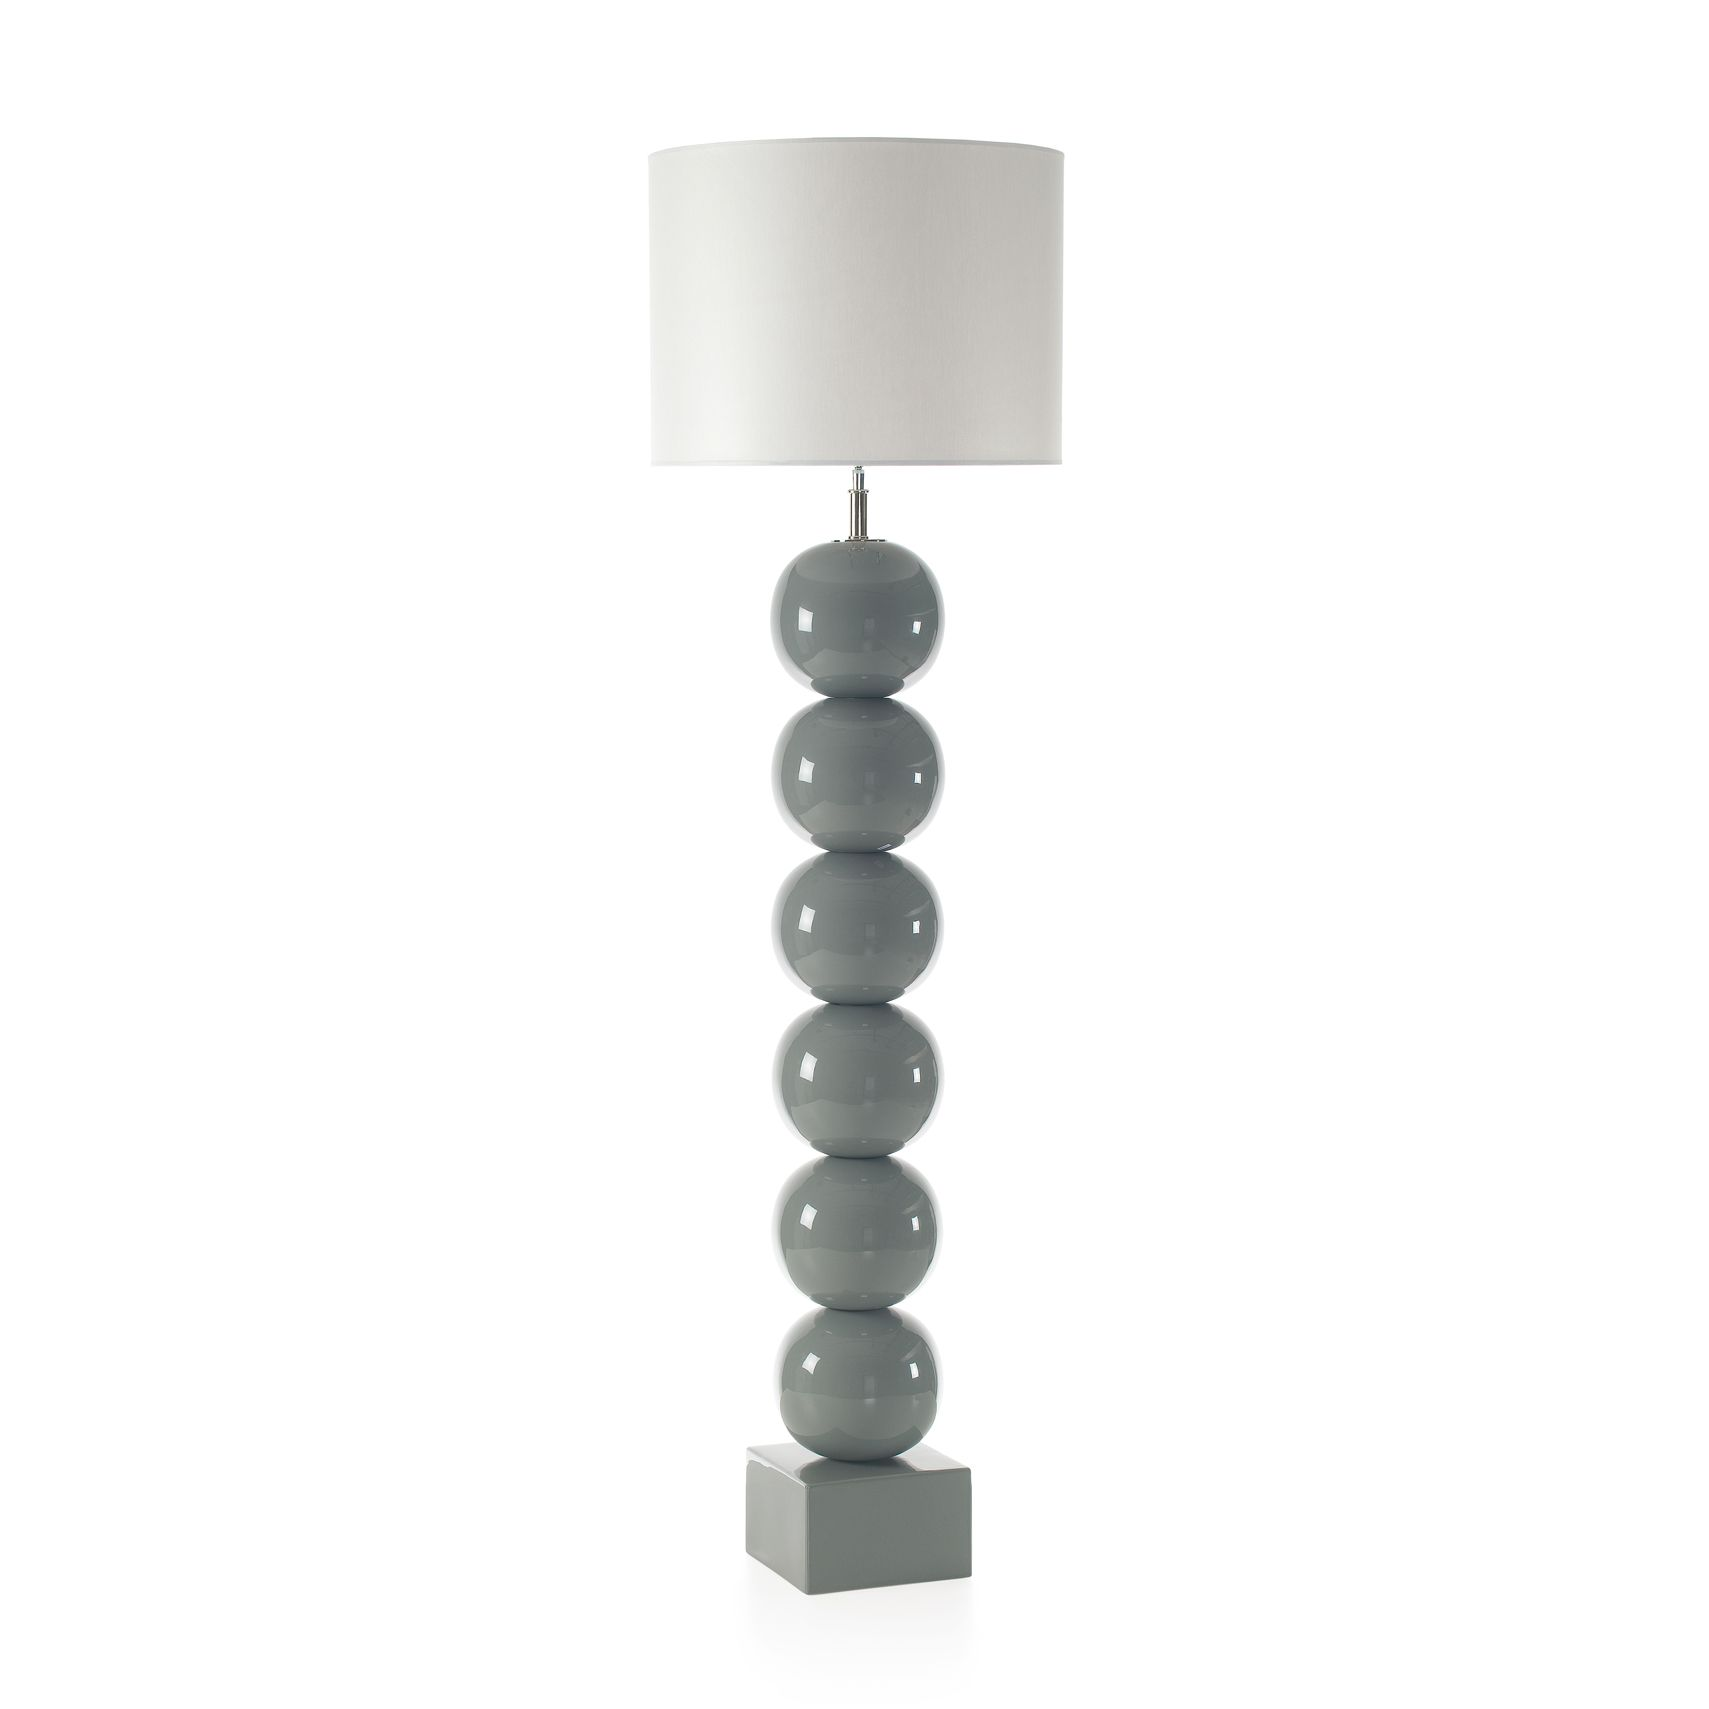 wooden lamp lampada of harald luxury tonon lamps floor by guggenbichler traditional design